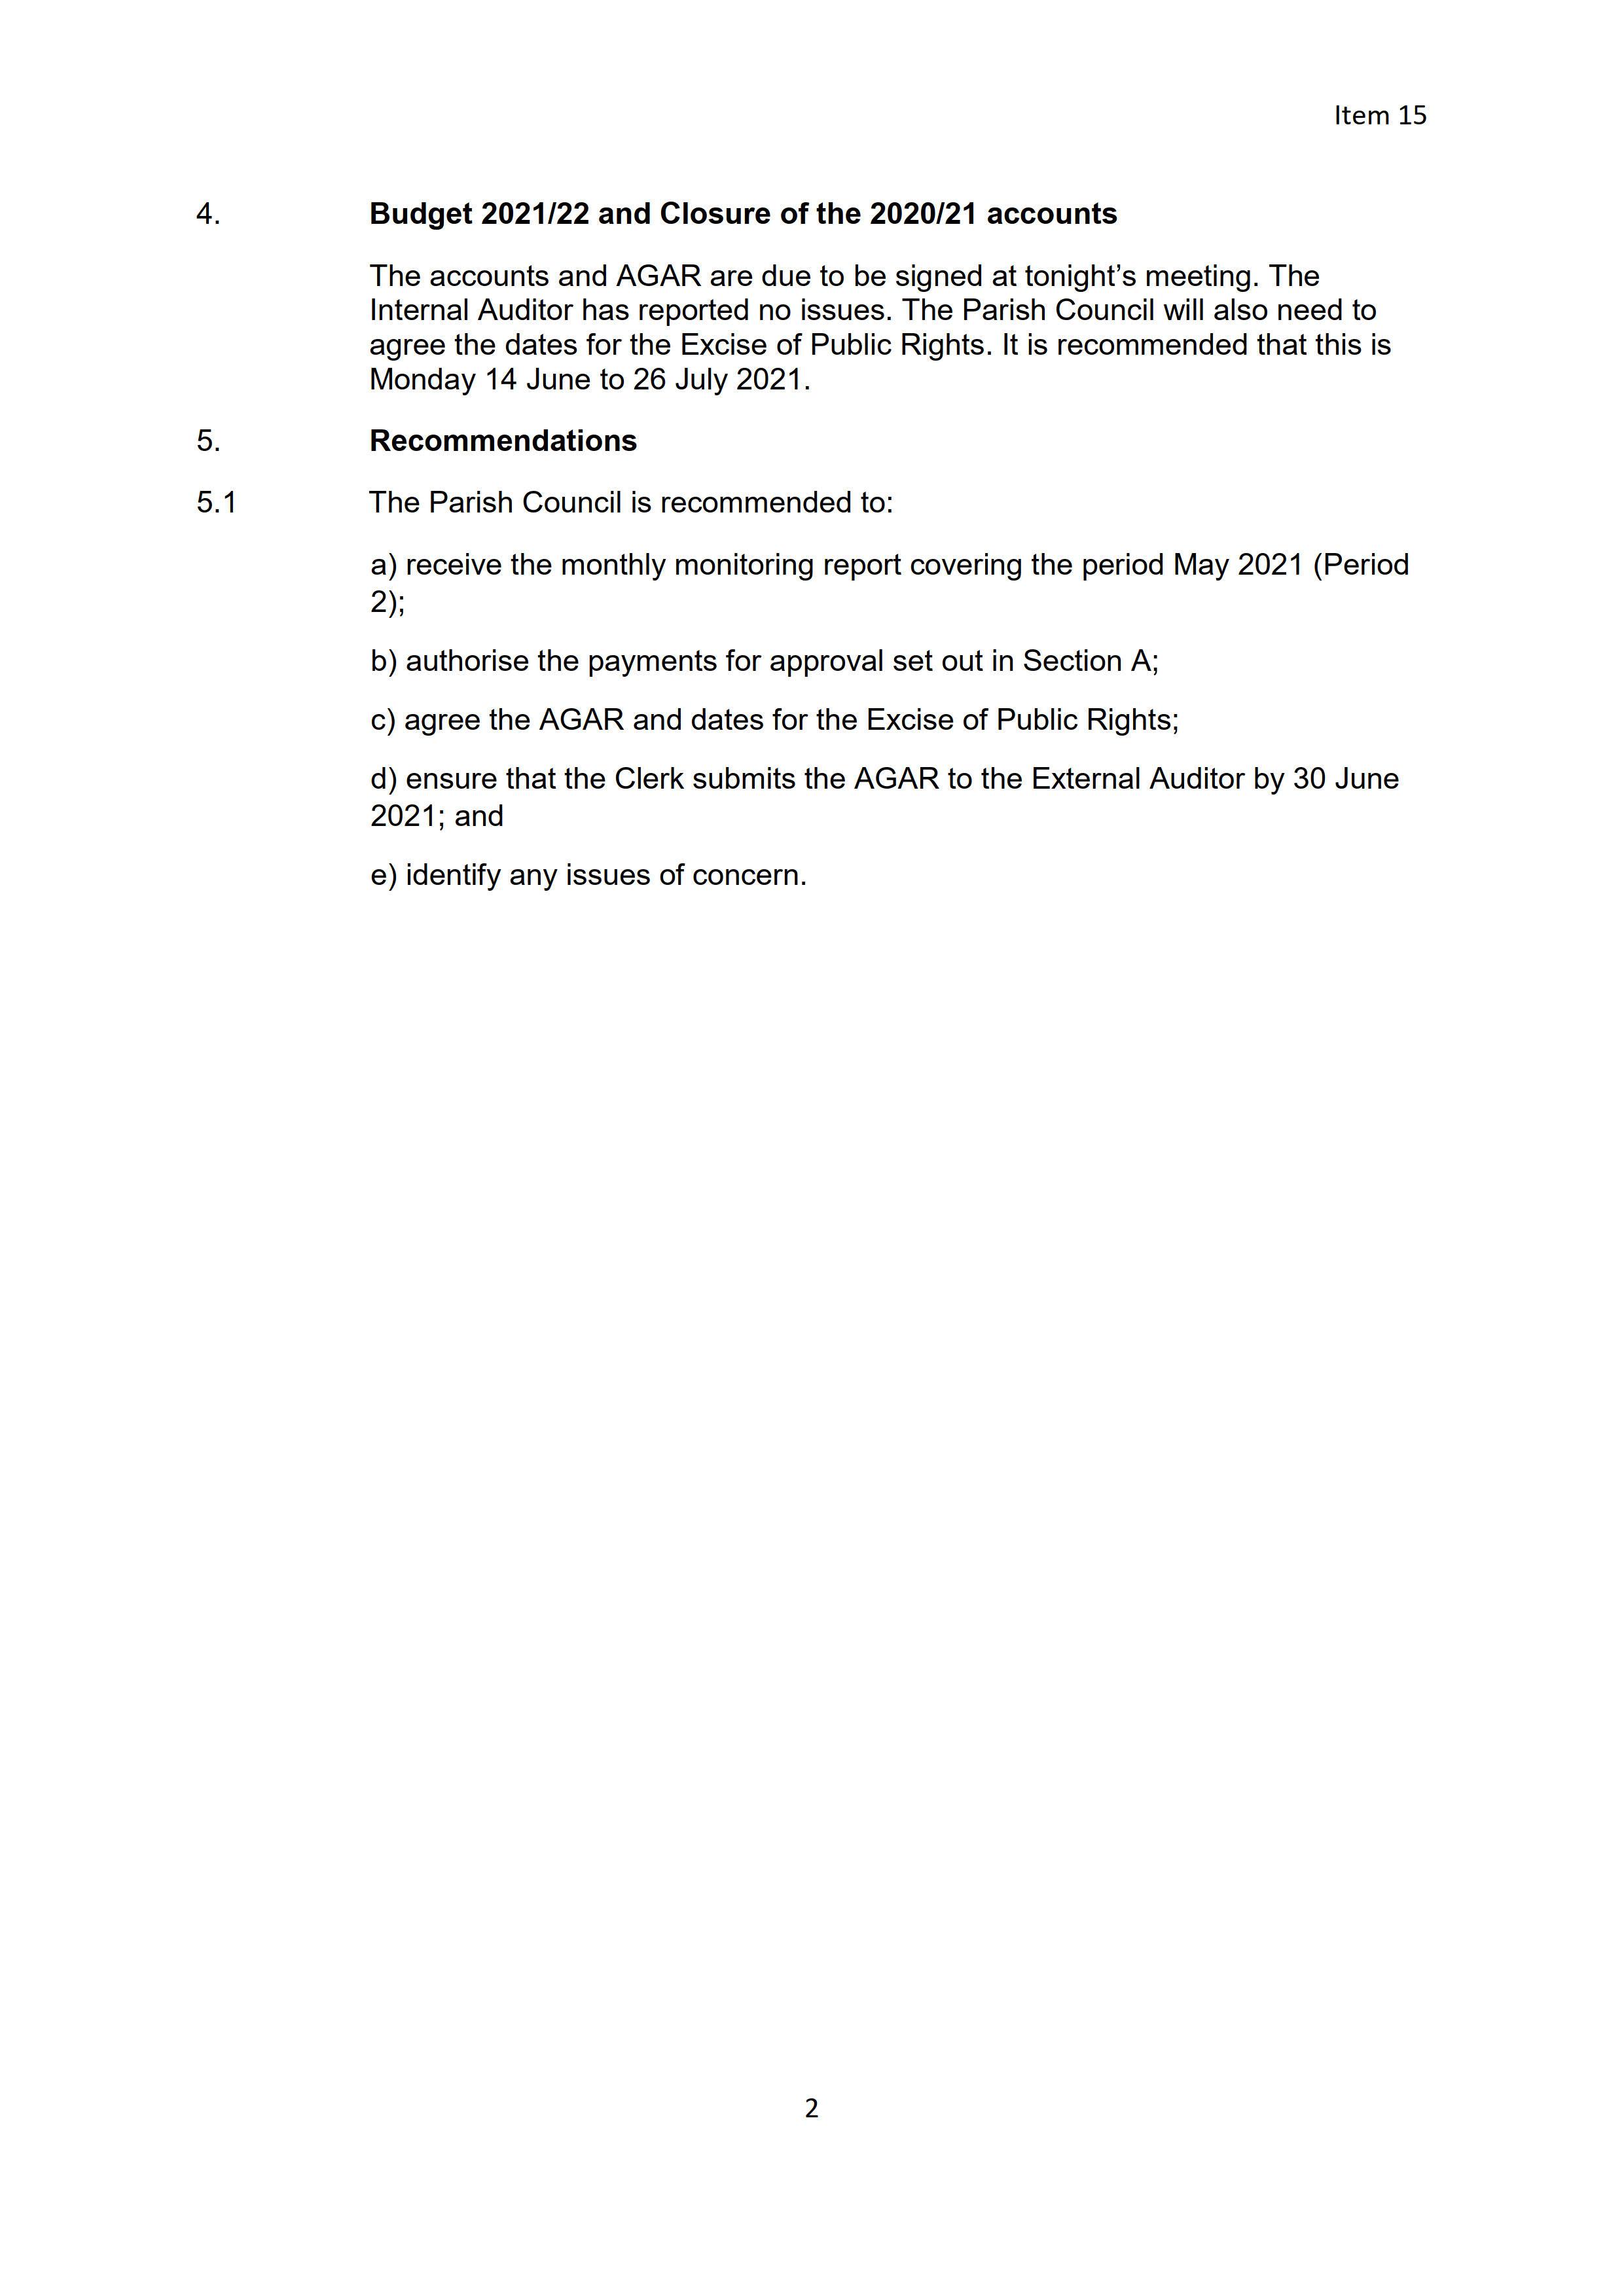 Item_15_Budget_Monitoring_report_2.jpg